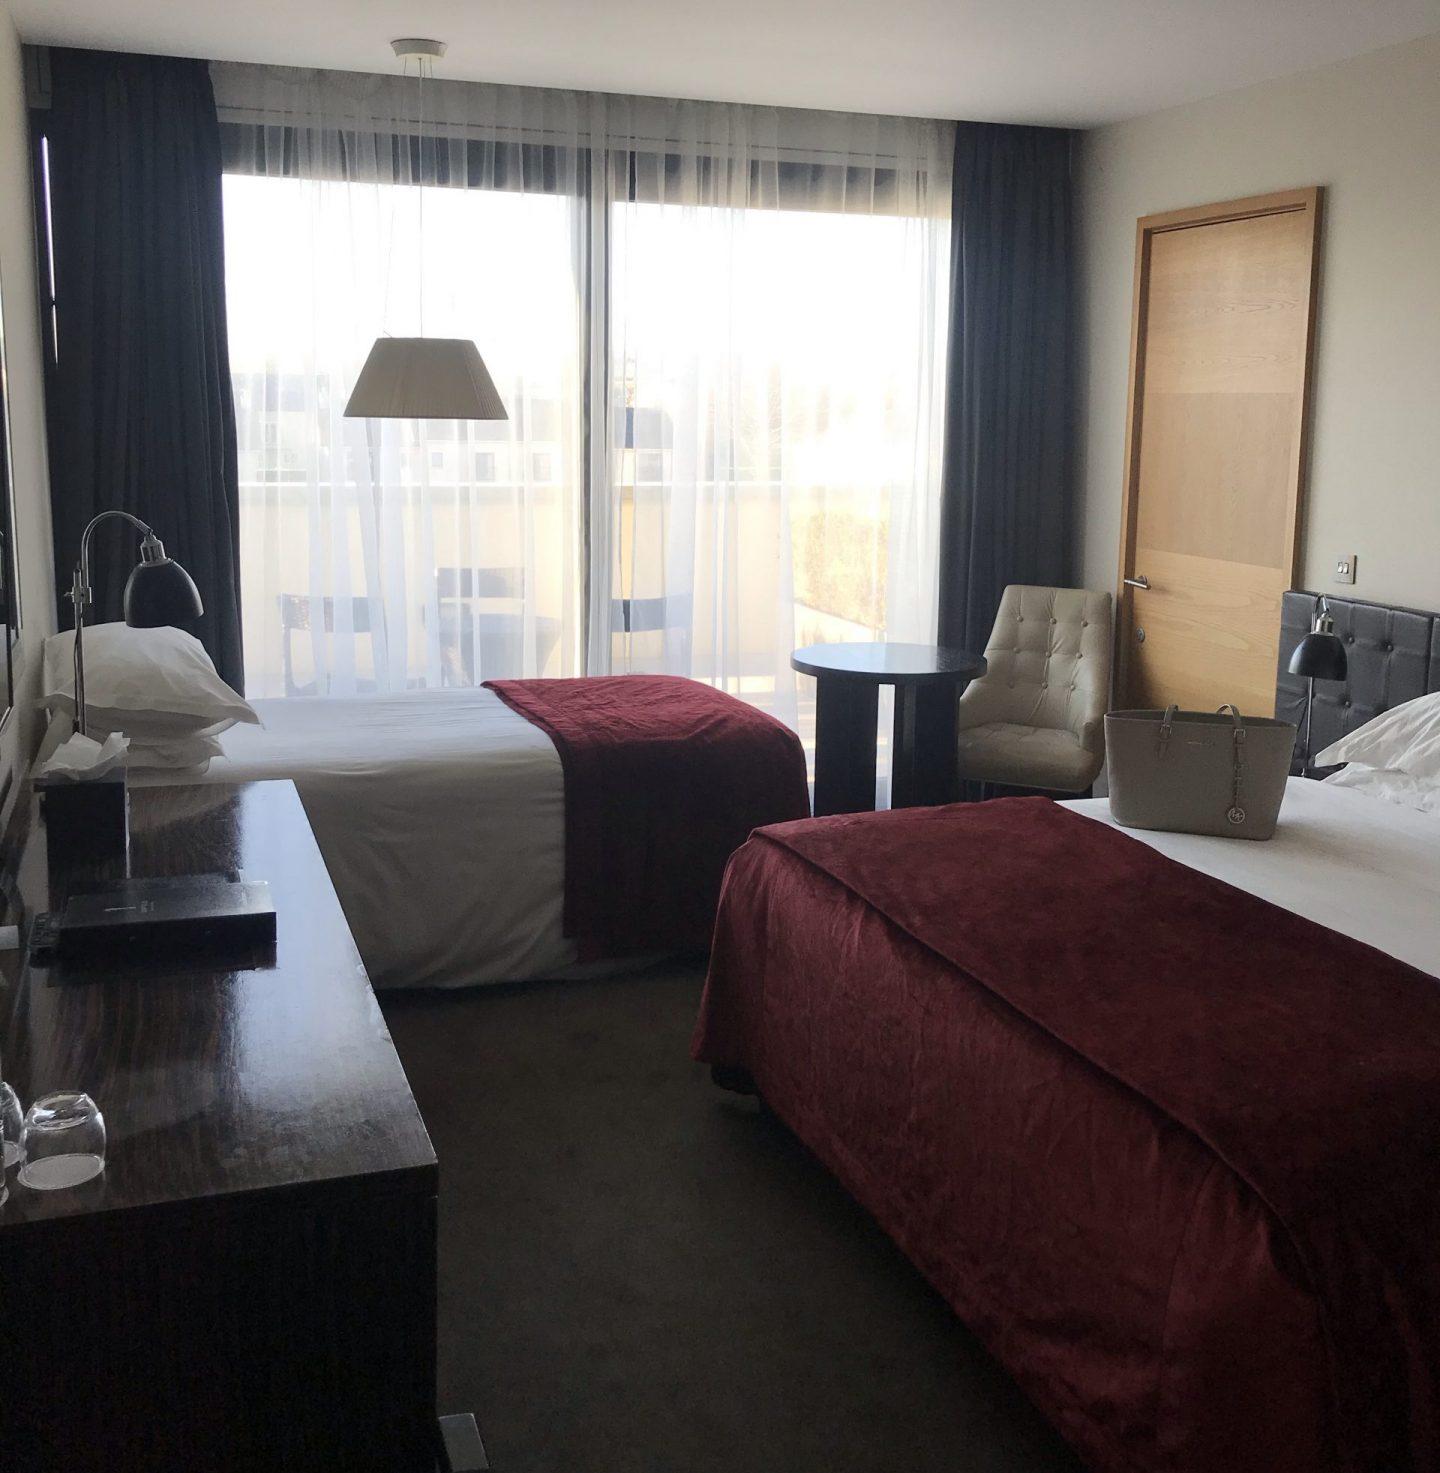 seafield hotel twin room